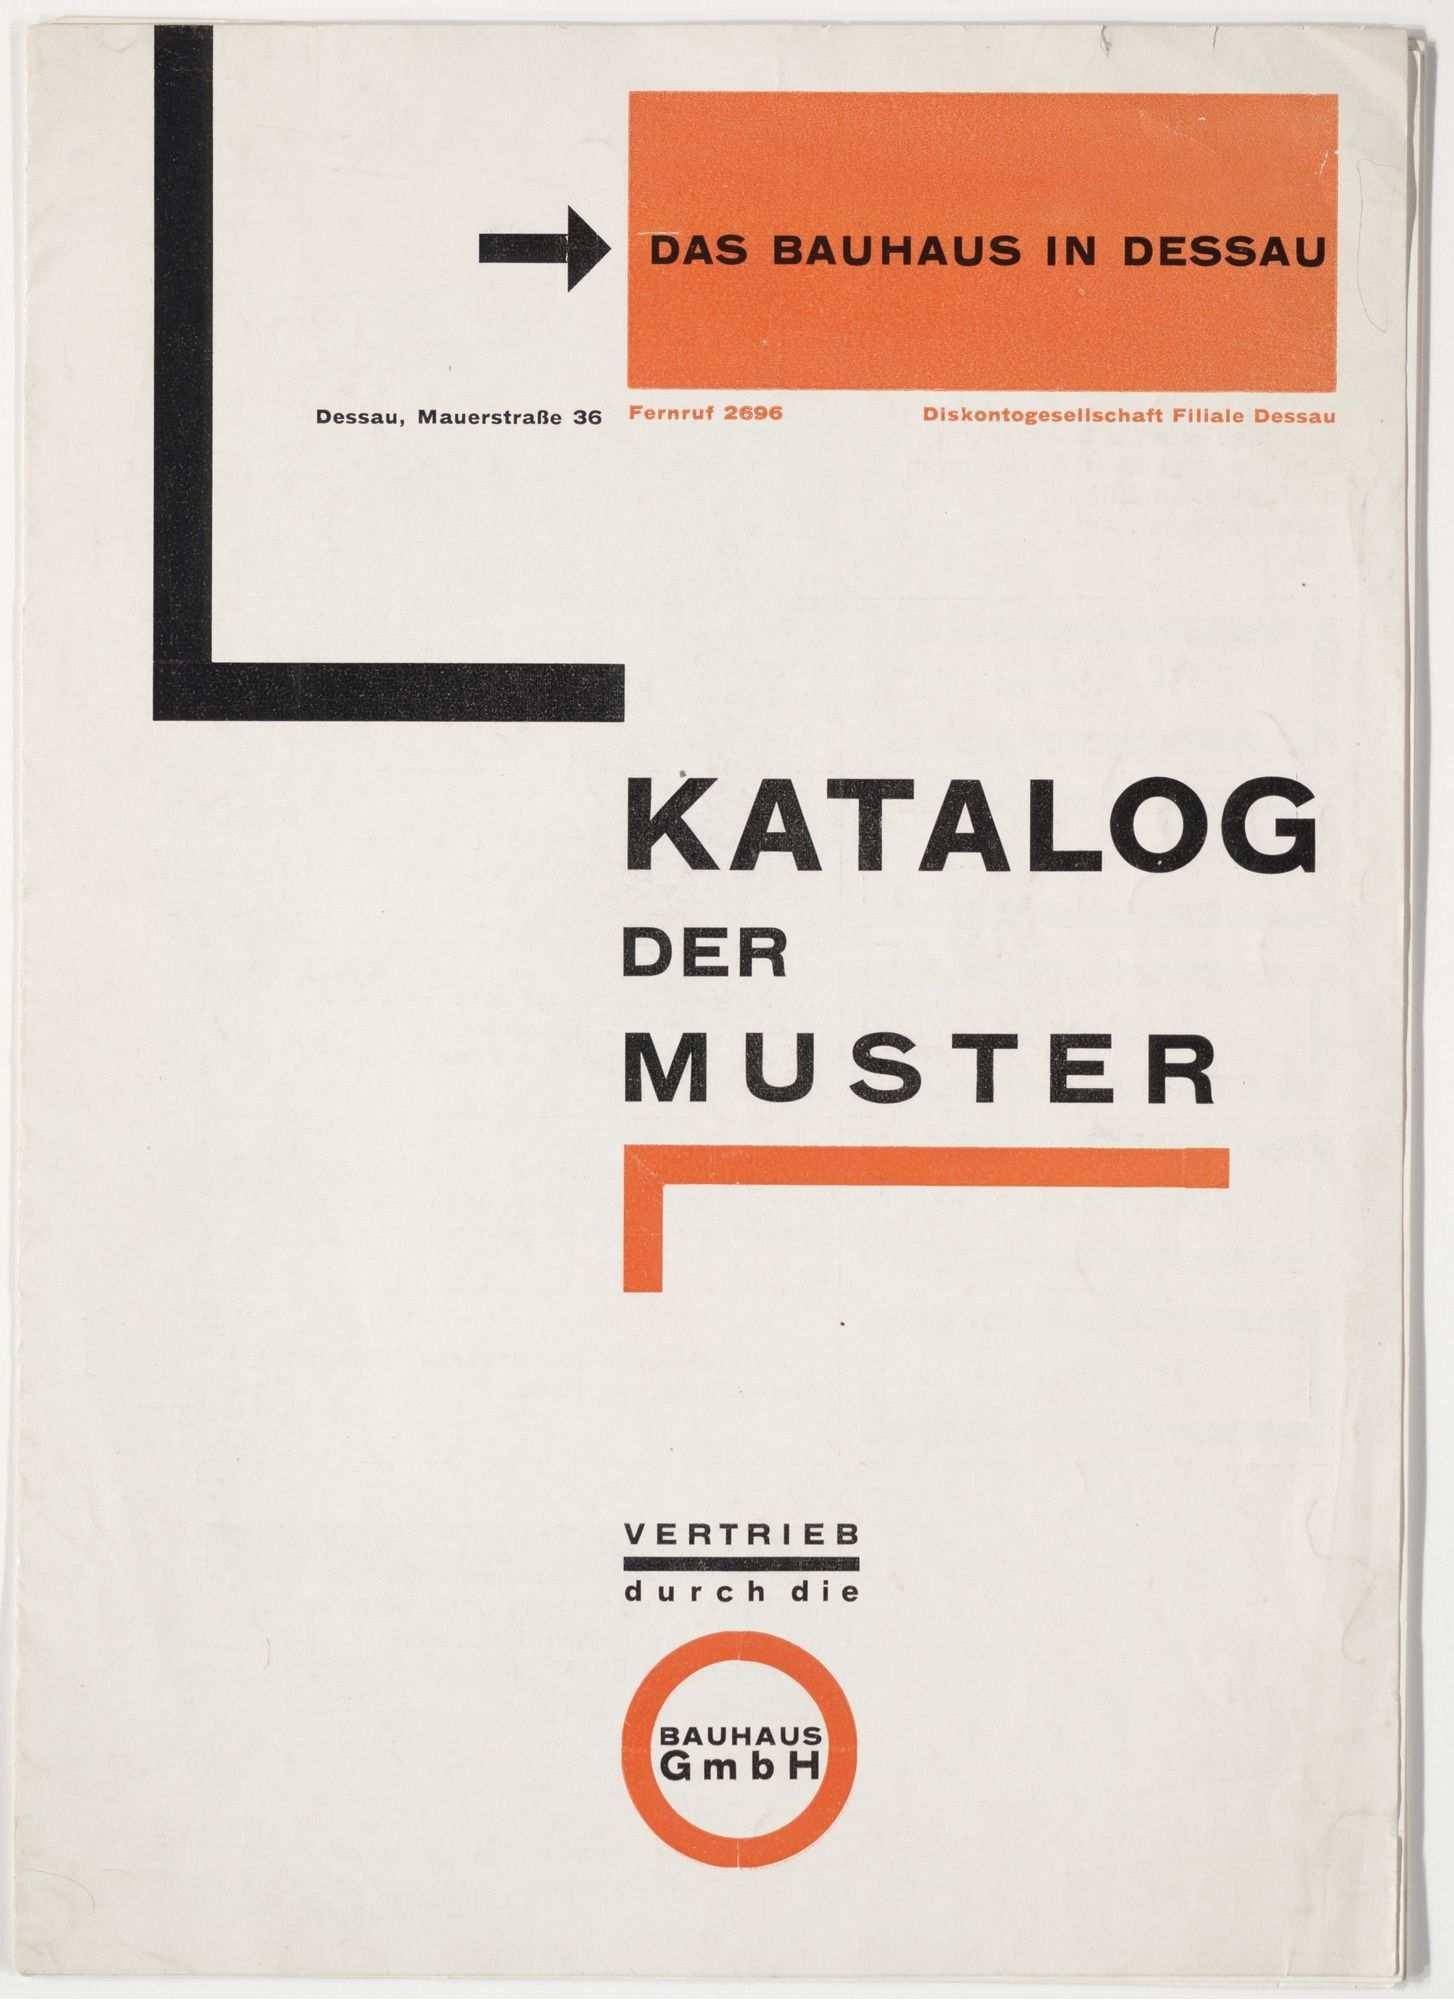 Herbert Bayer Das Bauhaus In Dessau Katalog Der Muster The Bauhaus In Dessau Catalogue Of Samples 1925 Herbert Bayer Bauhaus Catalog Cover Design